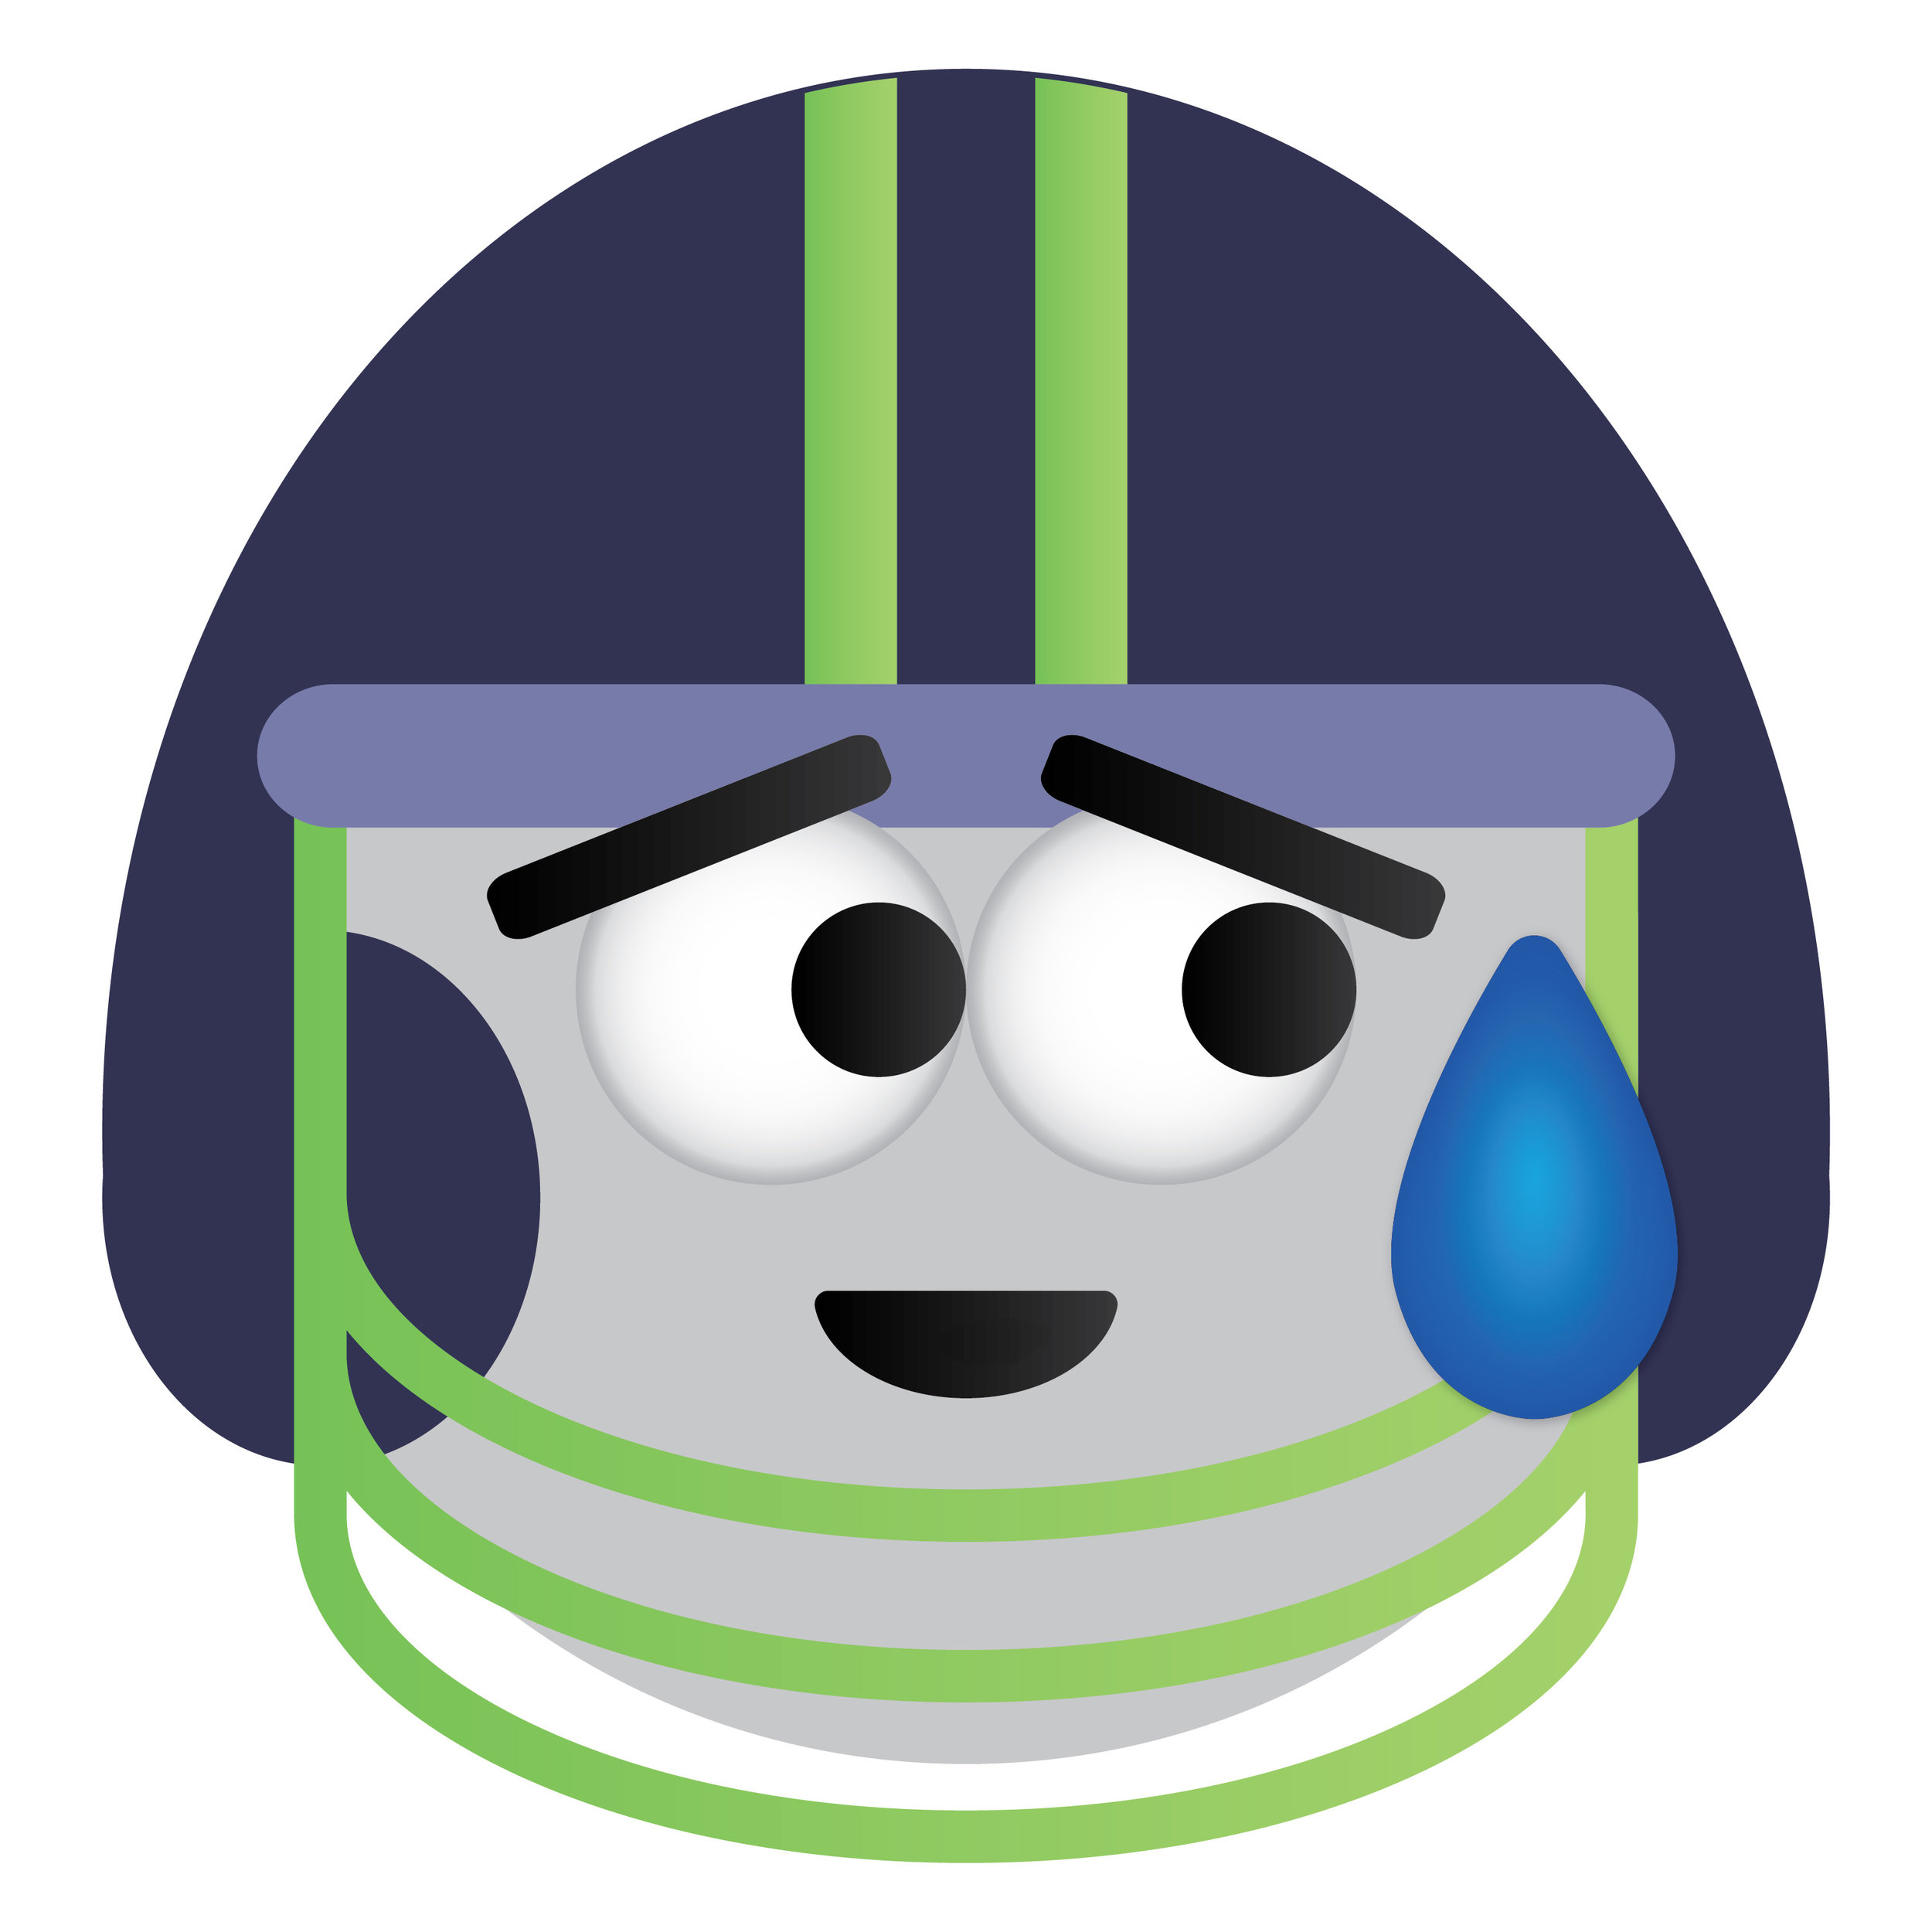 Emojis_Fall2018 [Recovered]_DM_Emoji_3.jpg